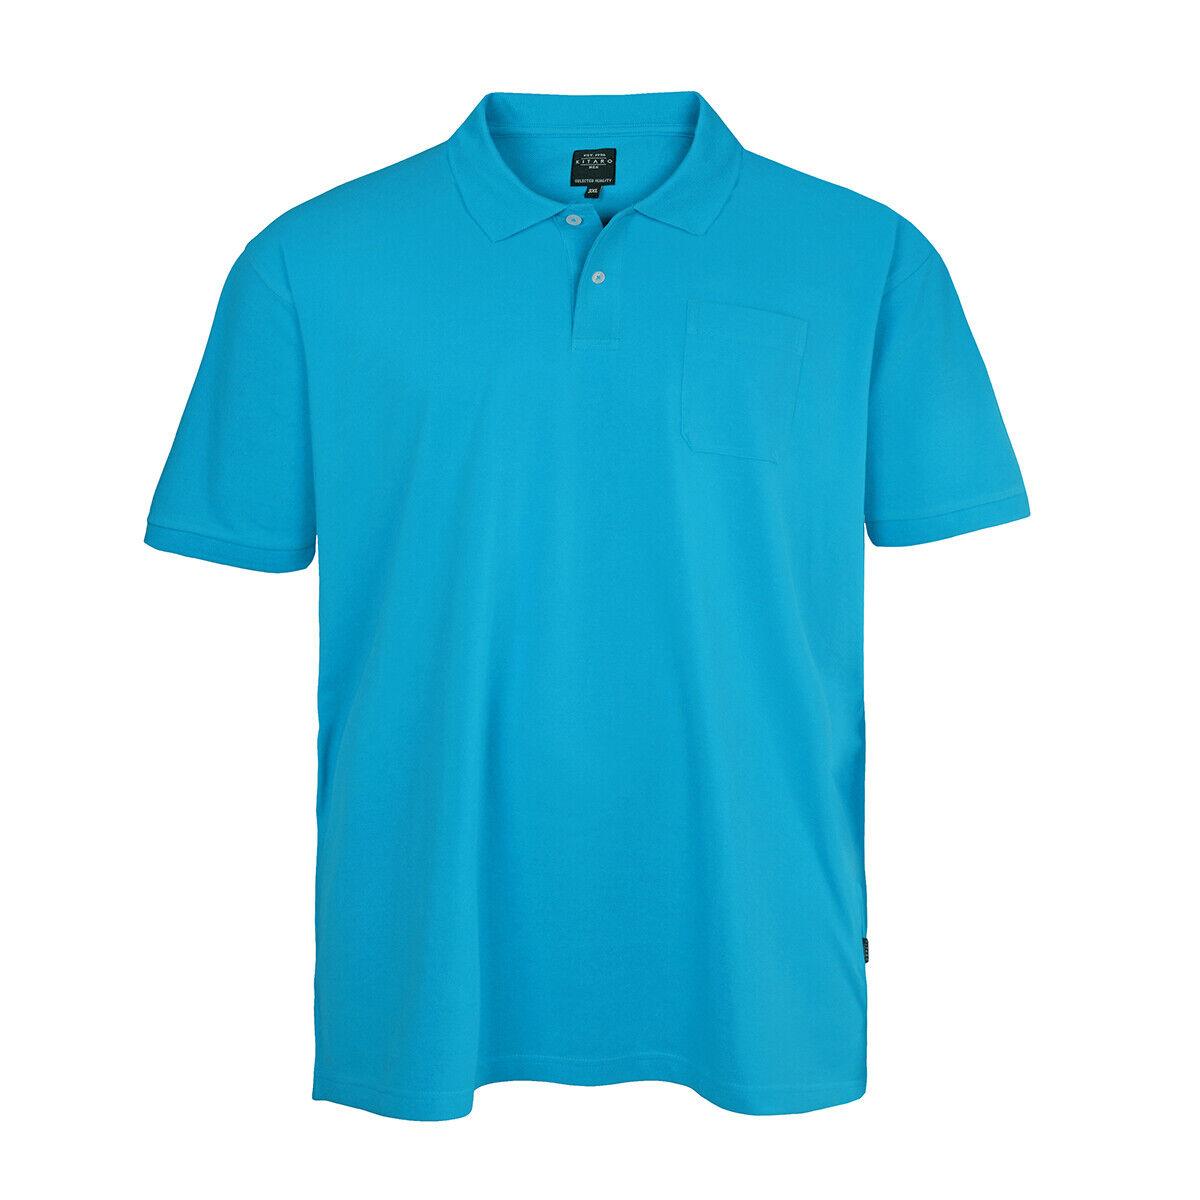 Kitaro Basic Piqué Poloshirt azurblue Übergröße